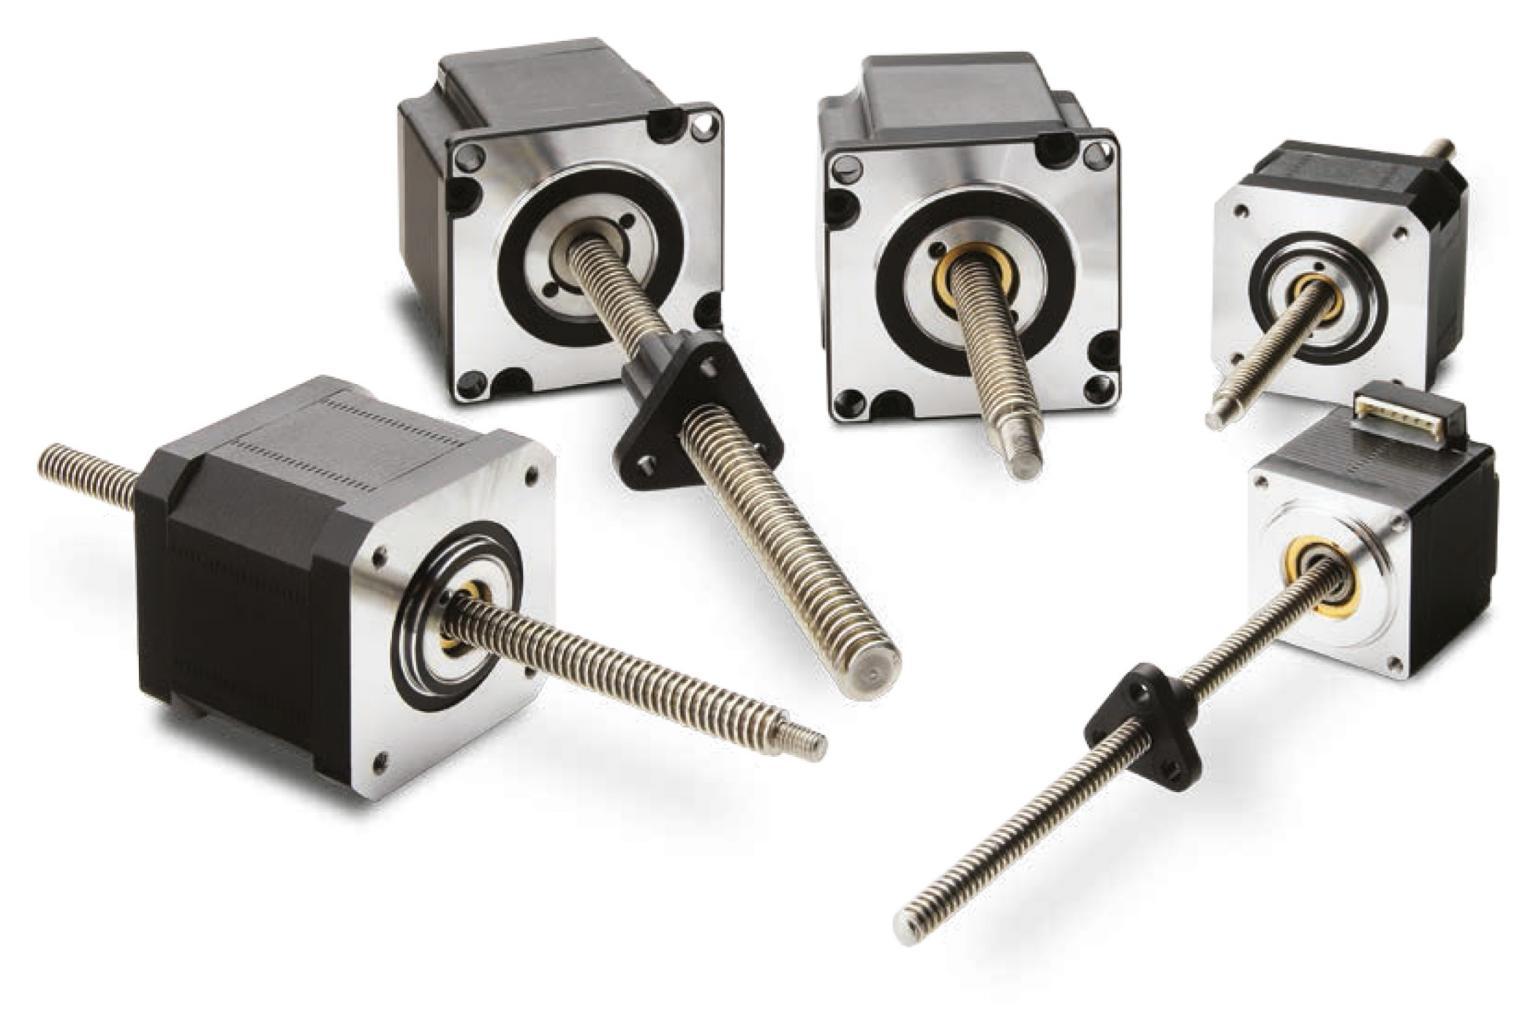 Thomson's new ML series stepper motorised leadscrews - available from Heason Technology